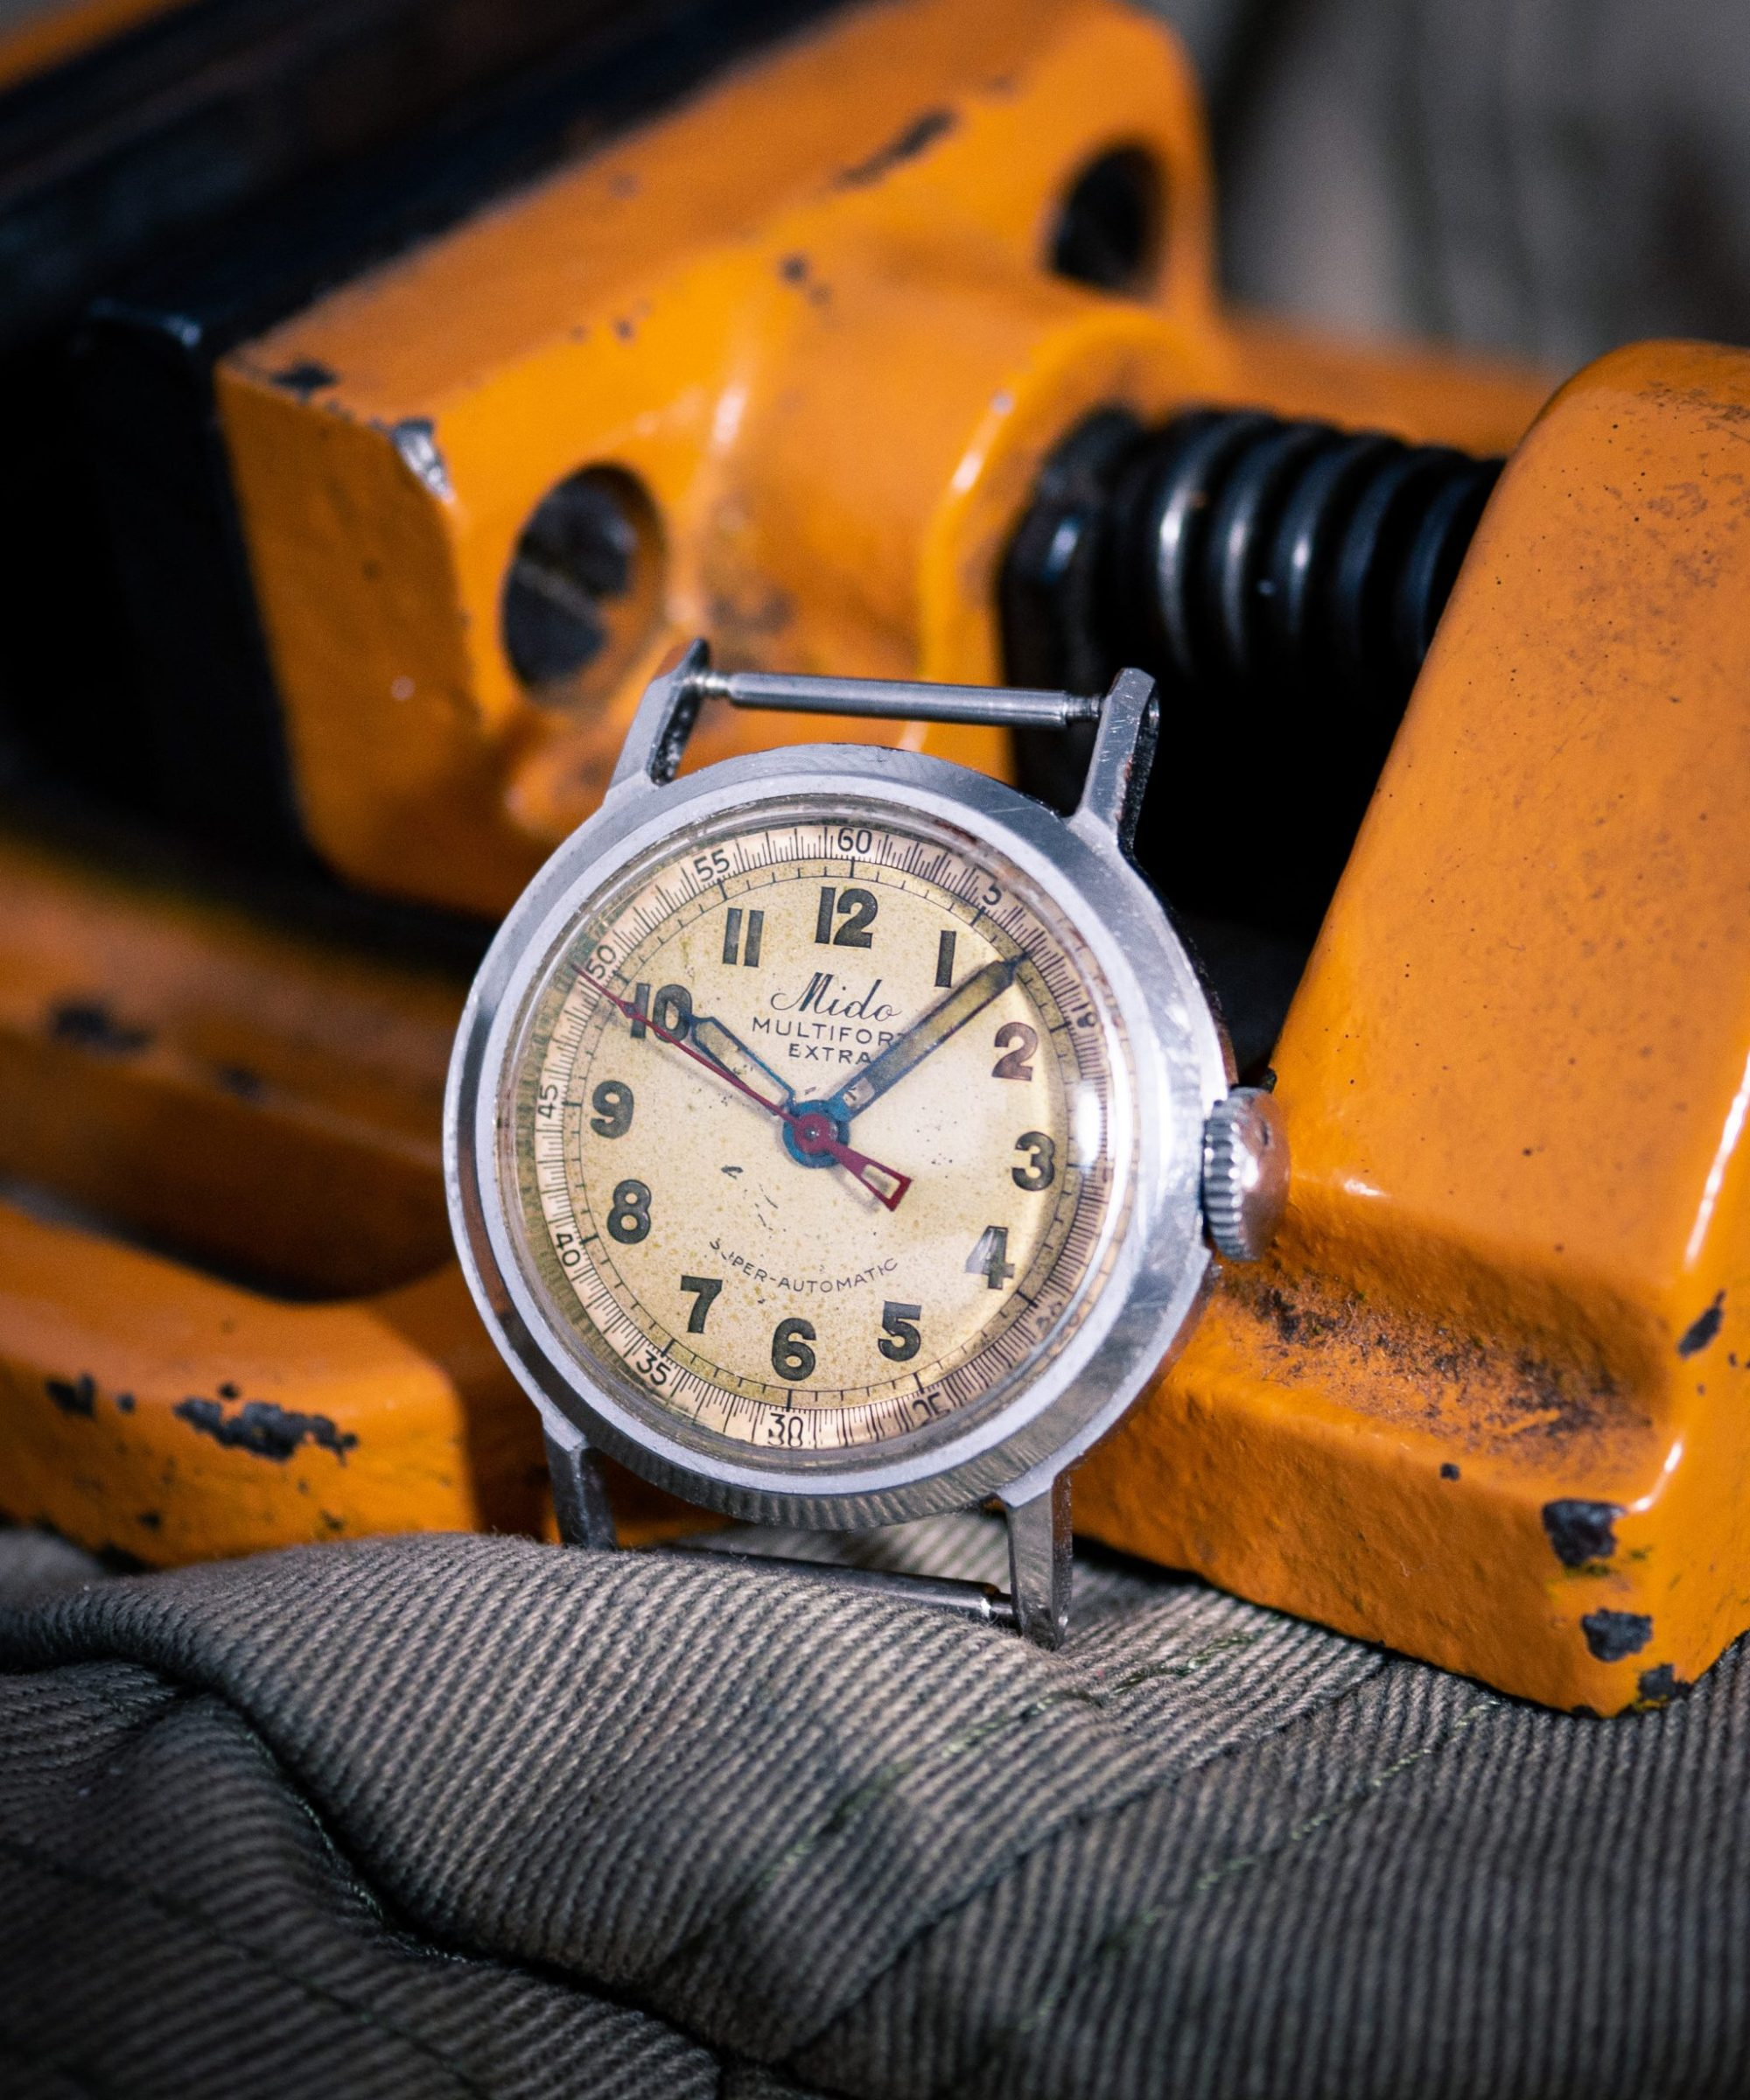 Vintage Mido Multifort Extra Super Automatic FB case Borgel Case Taubert Case Brit Pat case Mido multifort vintage watch